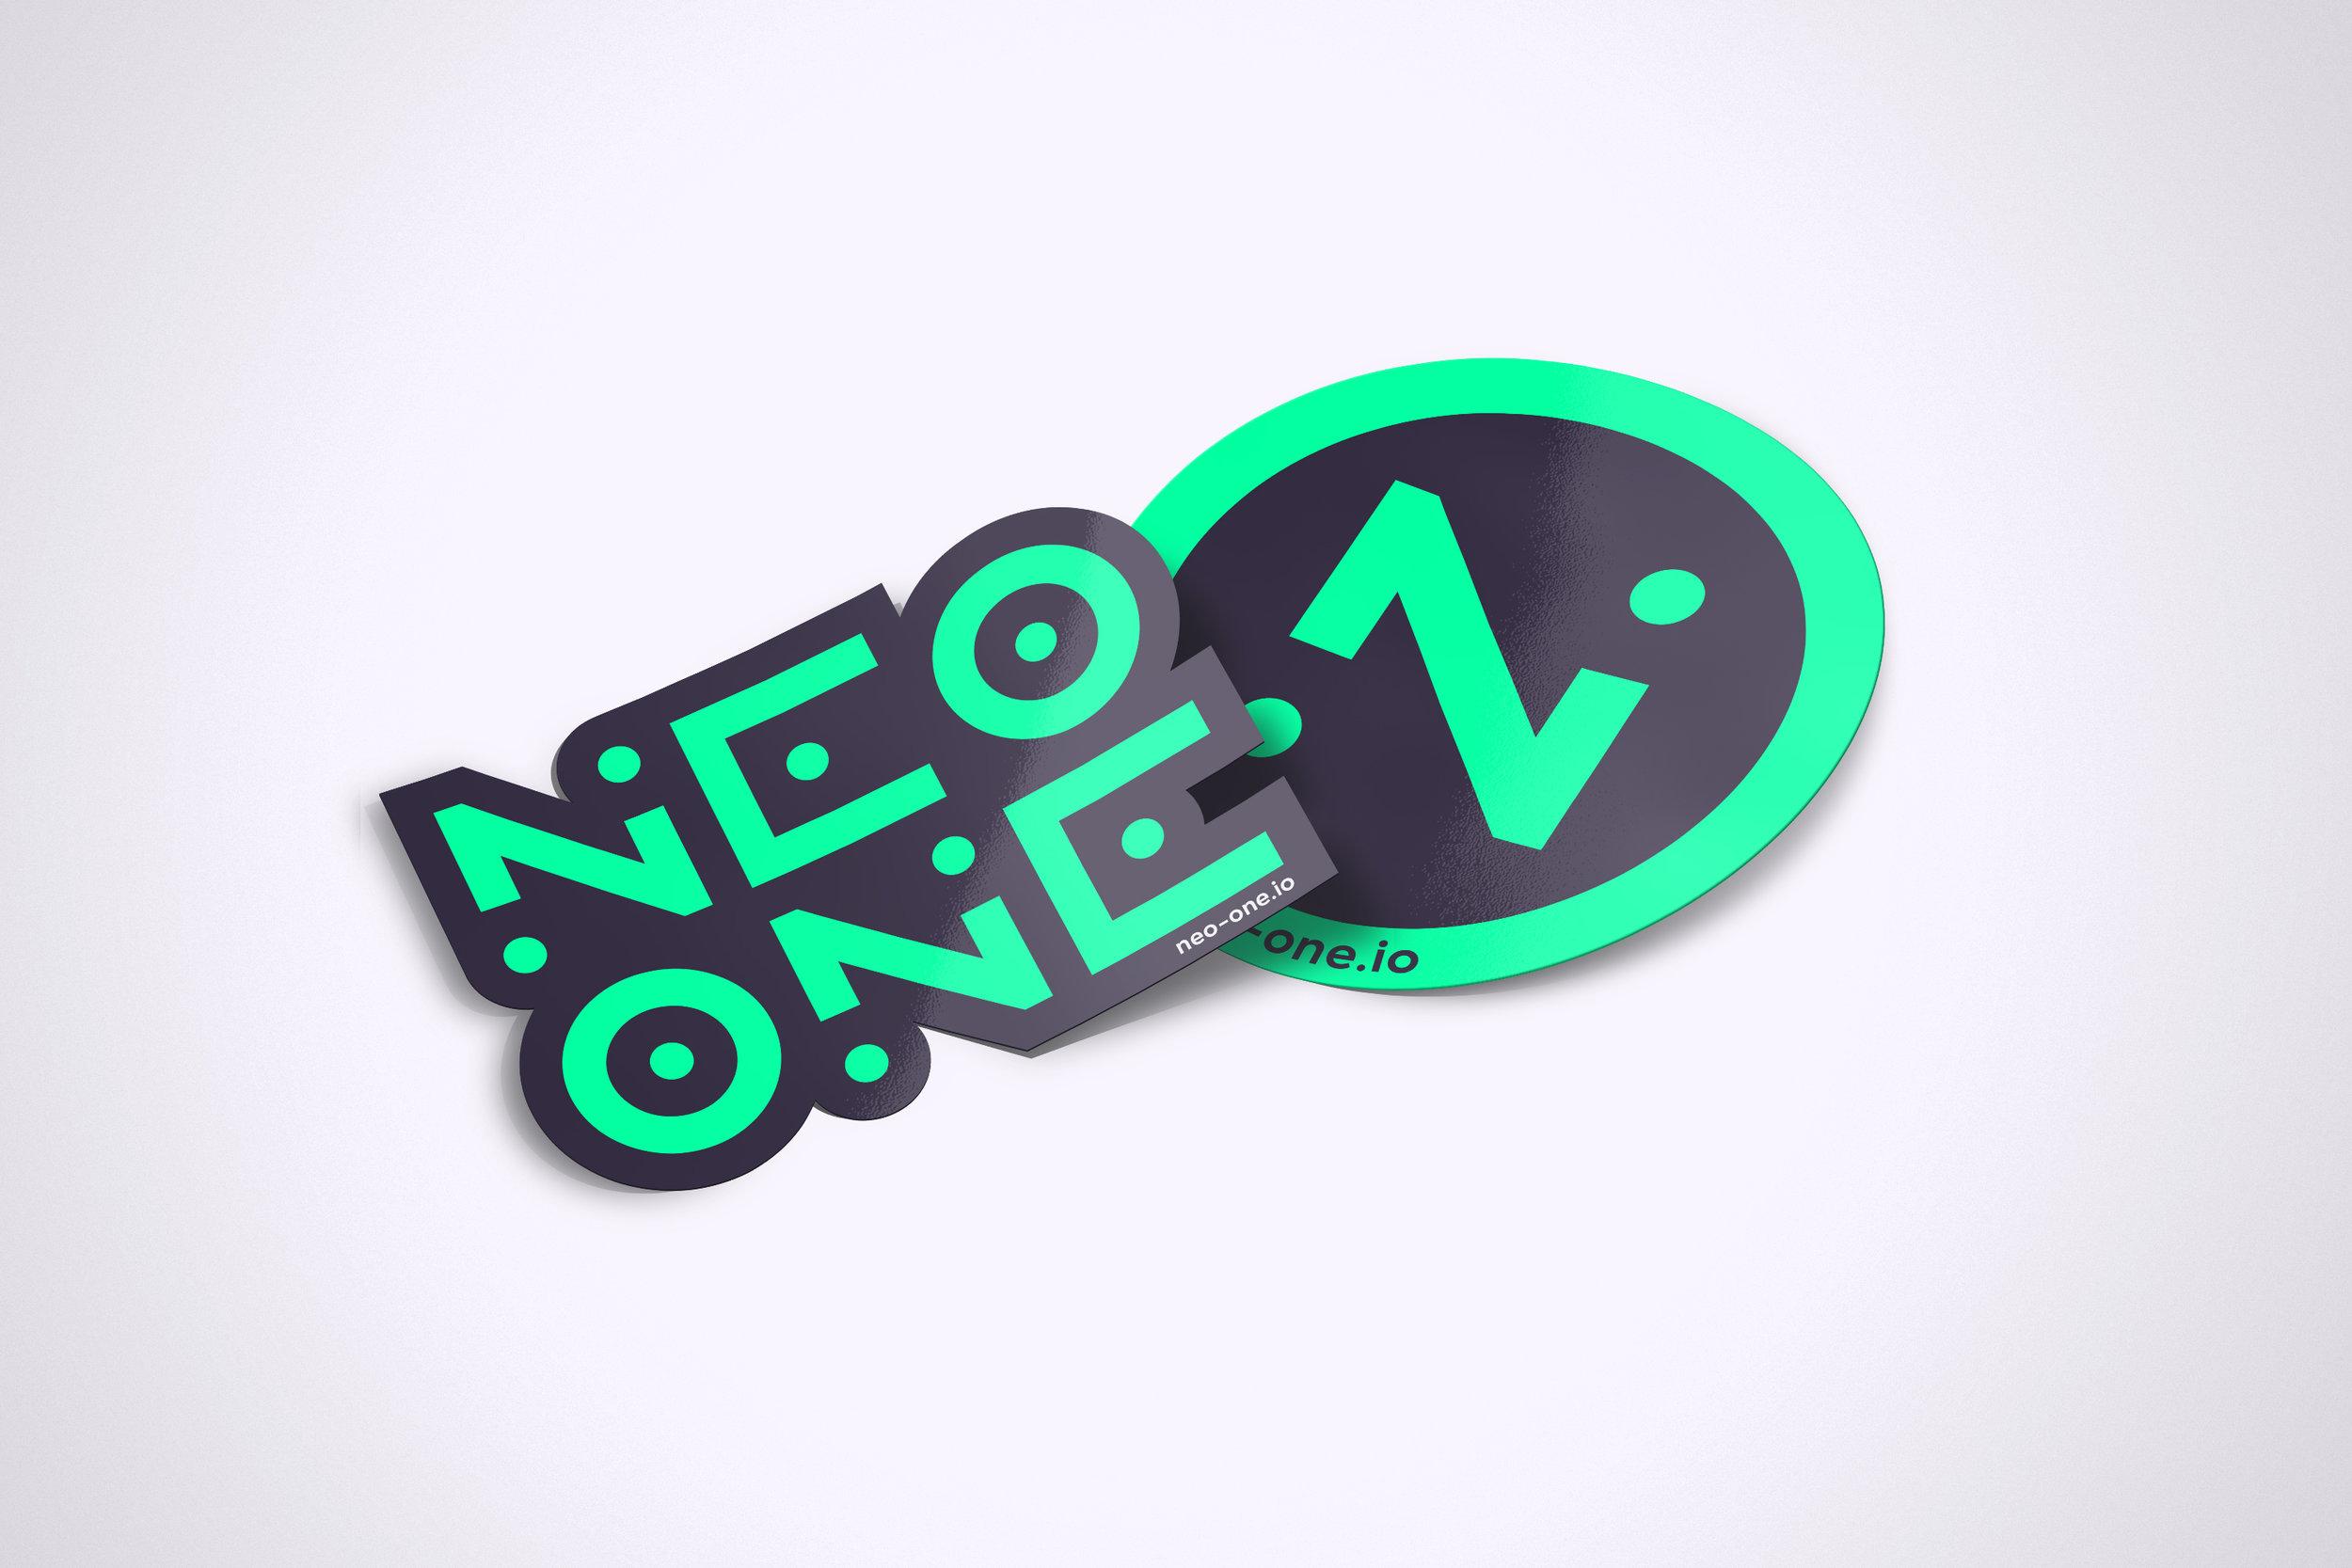 NEOB001_sticker_03.jpg